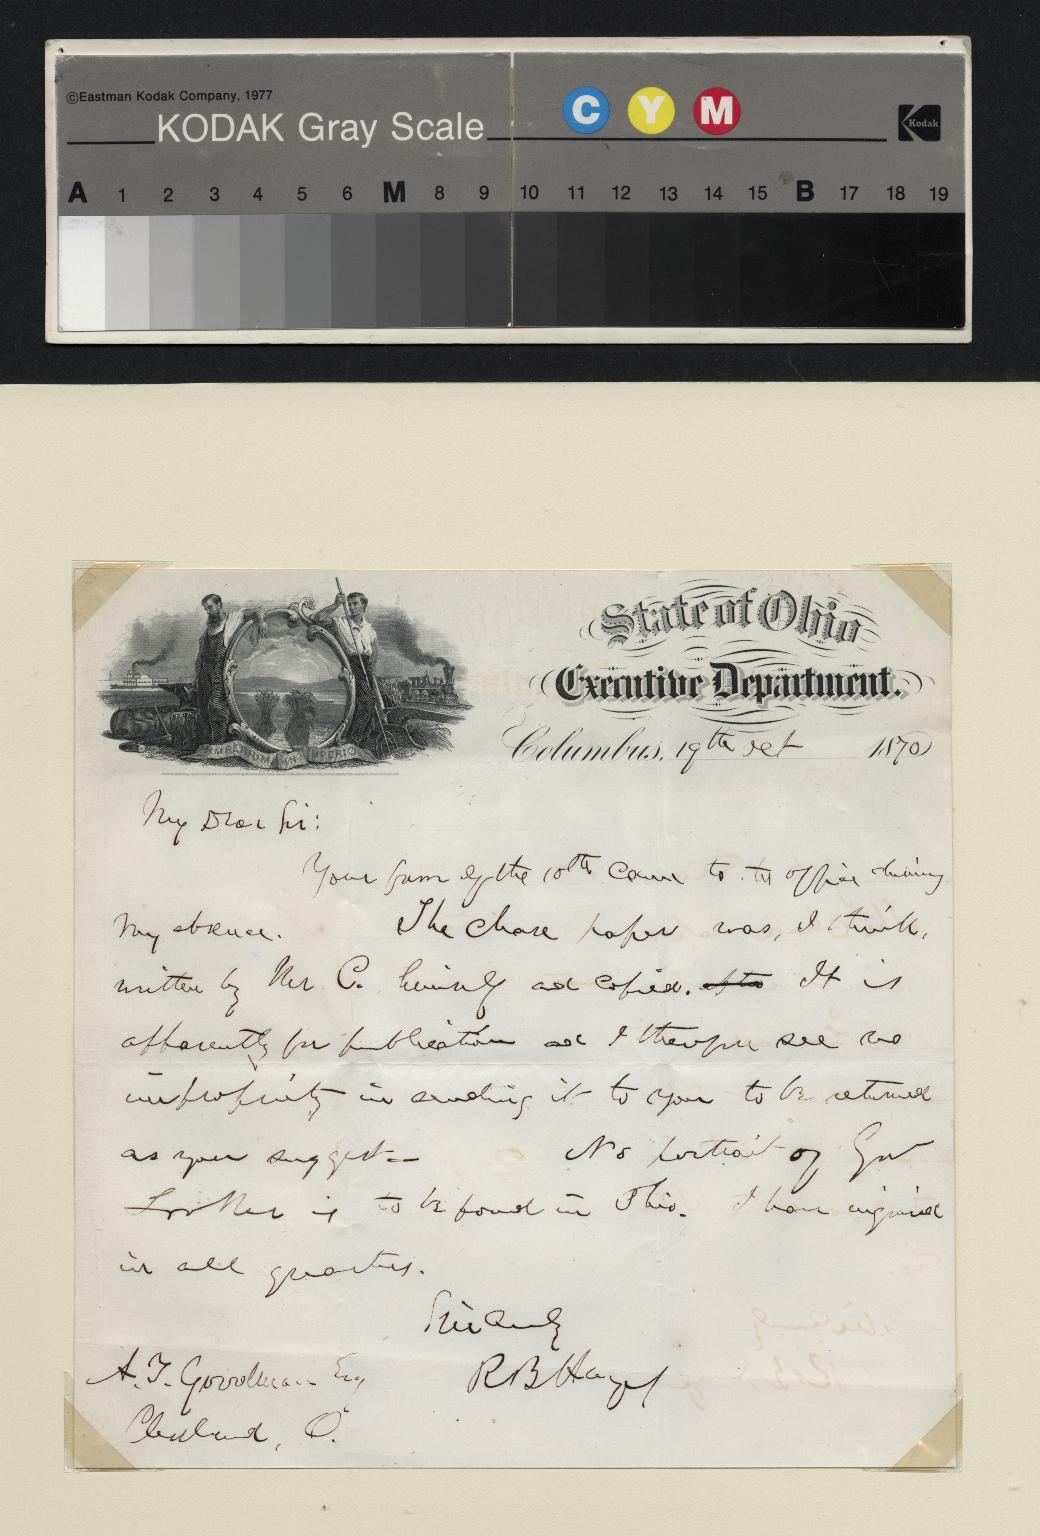 Hayes letter